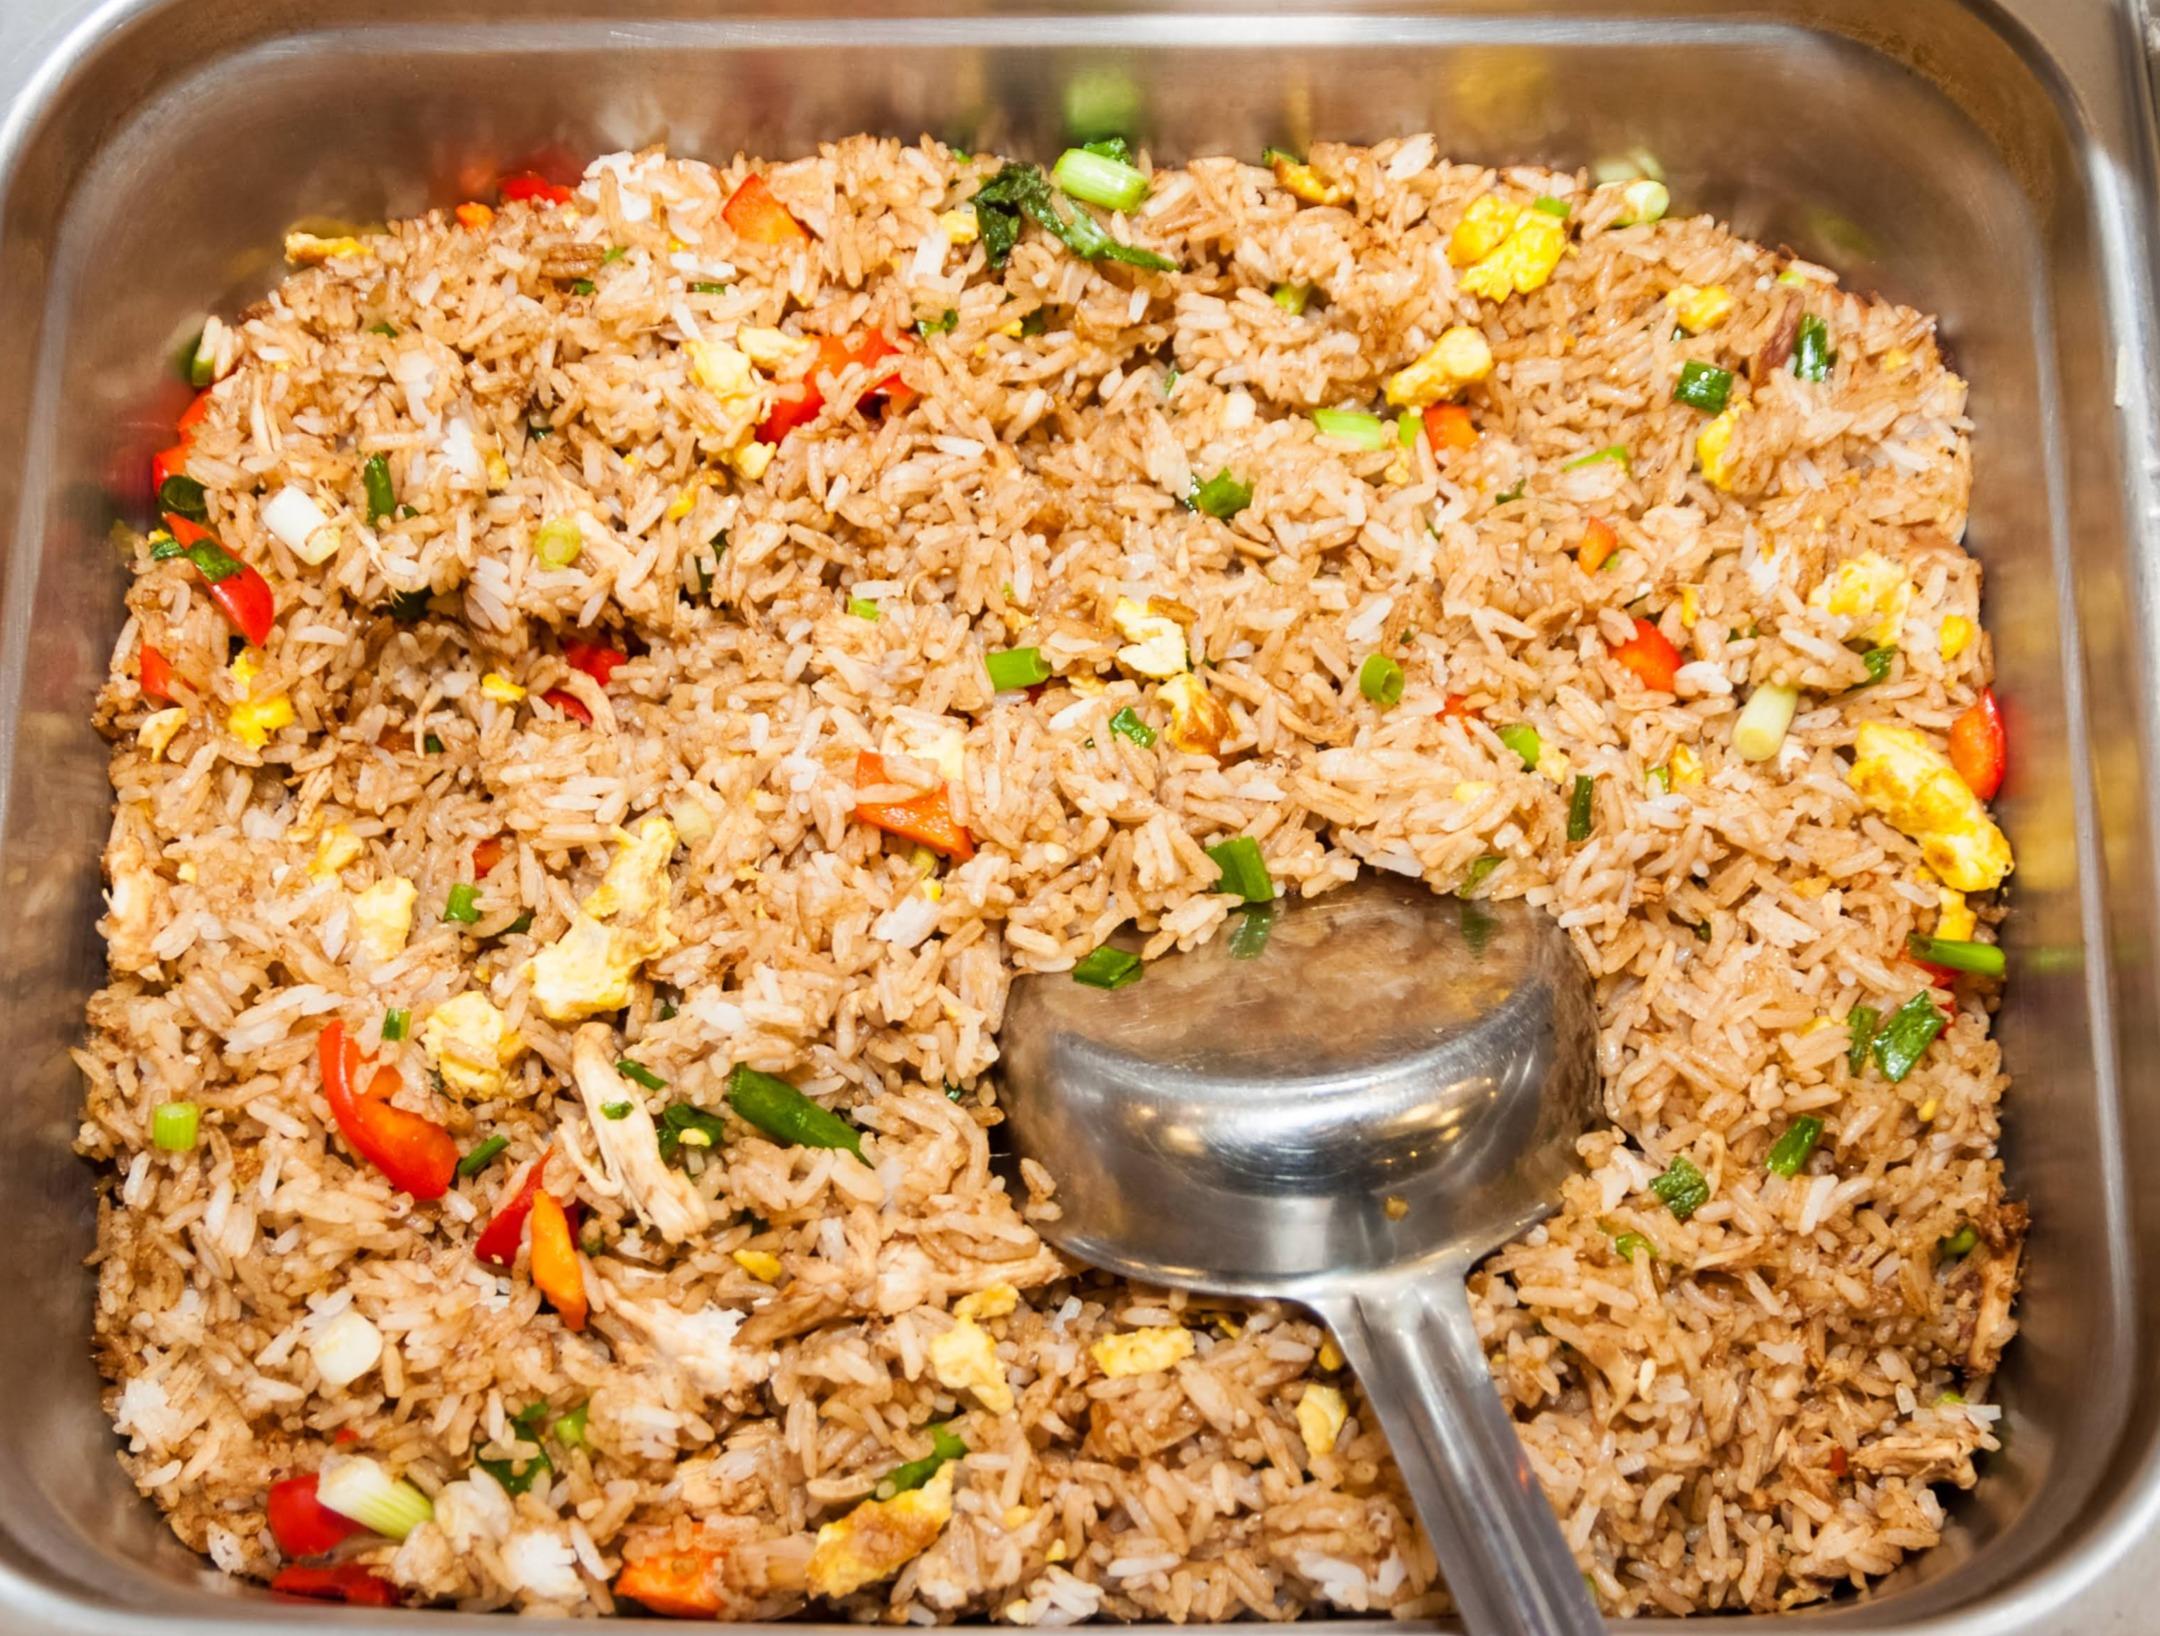 Fried Rice (Chaufa Rice)